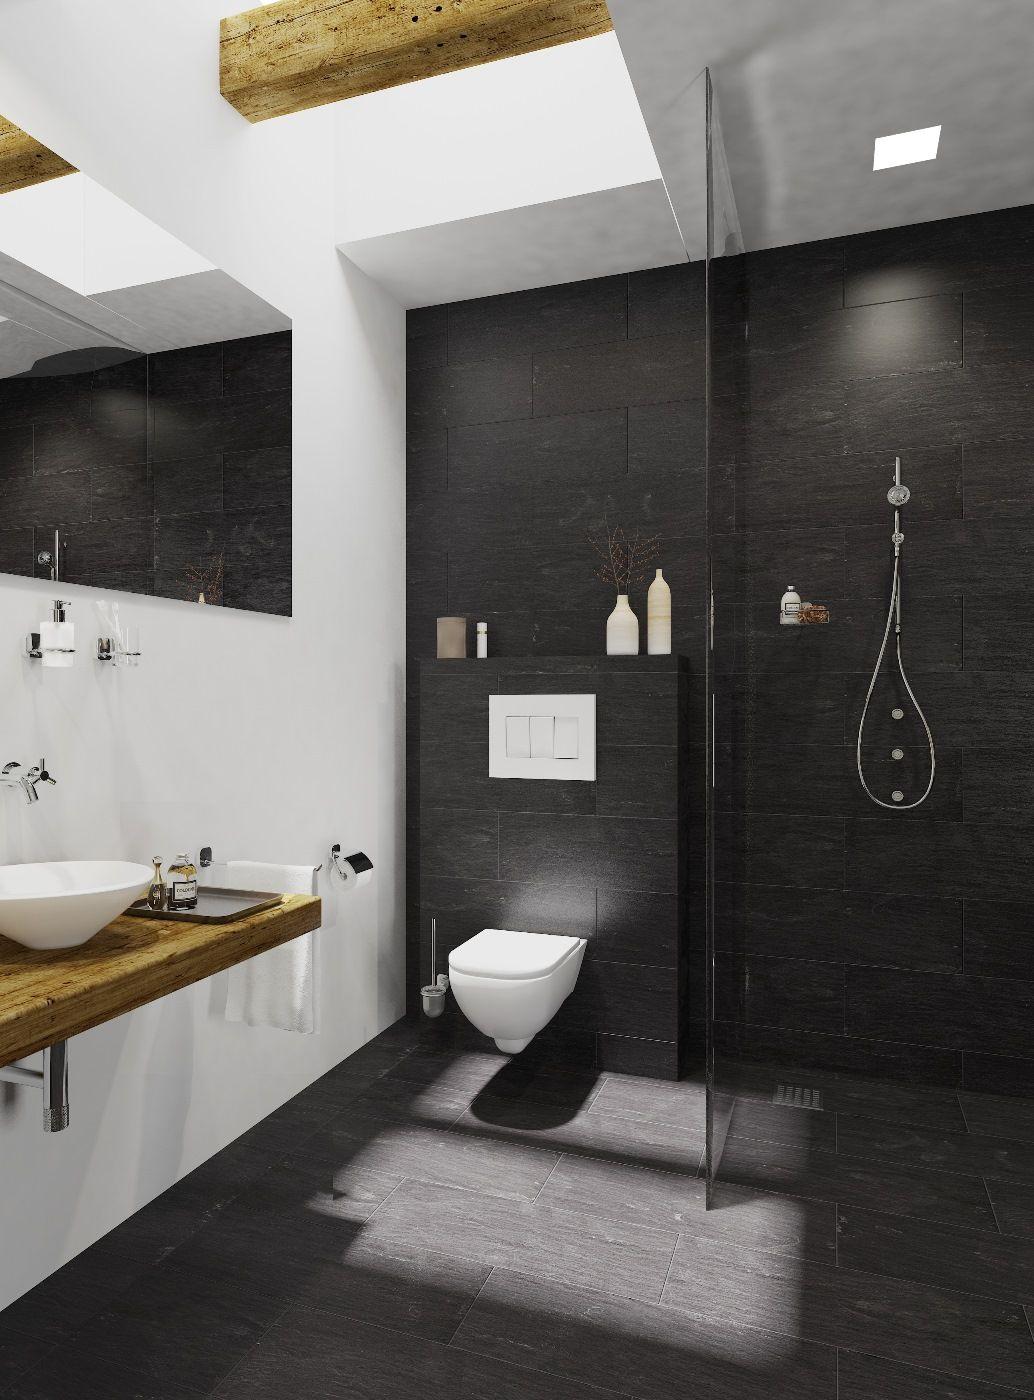 Plafond Ideen. Trendy Verlaagd Plafond Badkamer Gamma Galerij Voor ...